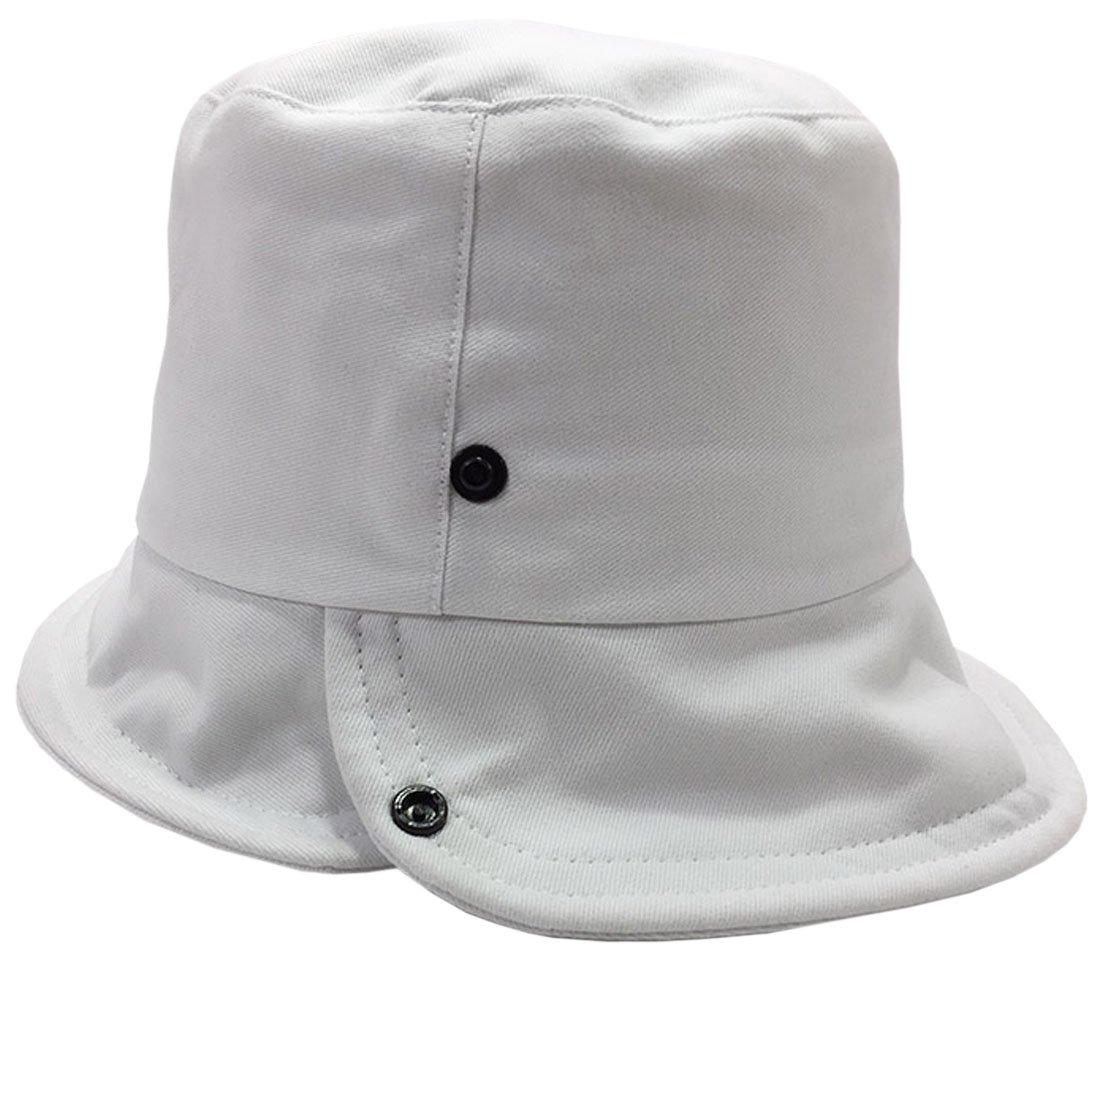 YueLian Unisex Adult Womens Chic Solid Foldable Summer Bucket Hats